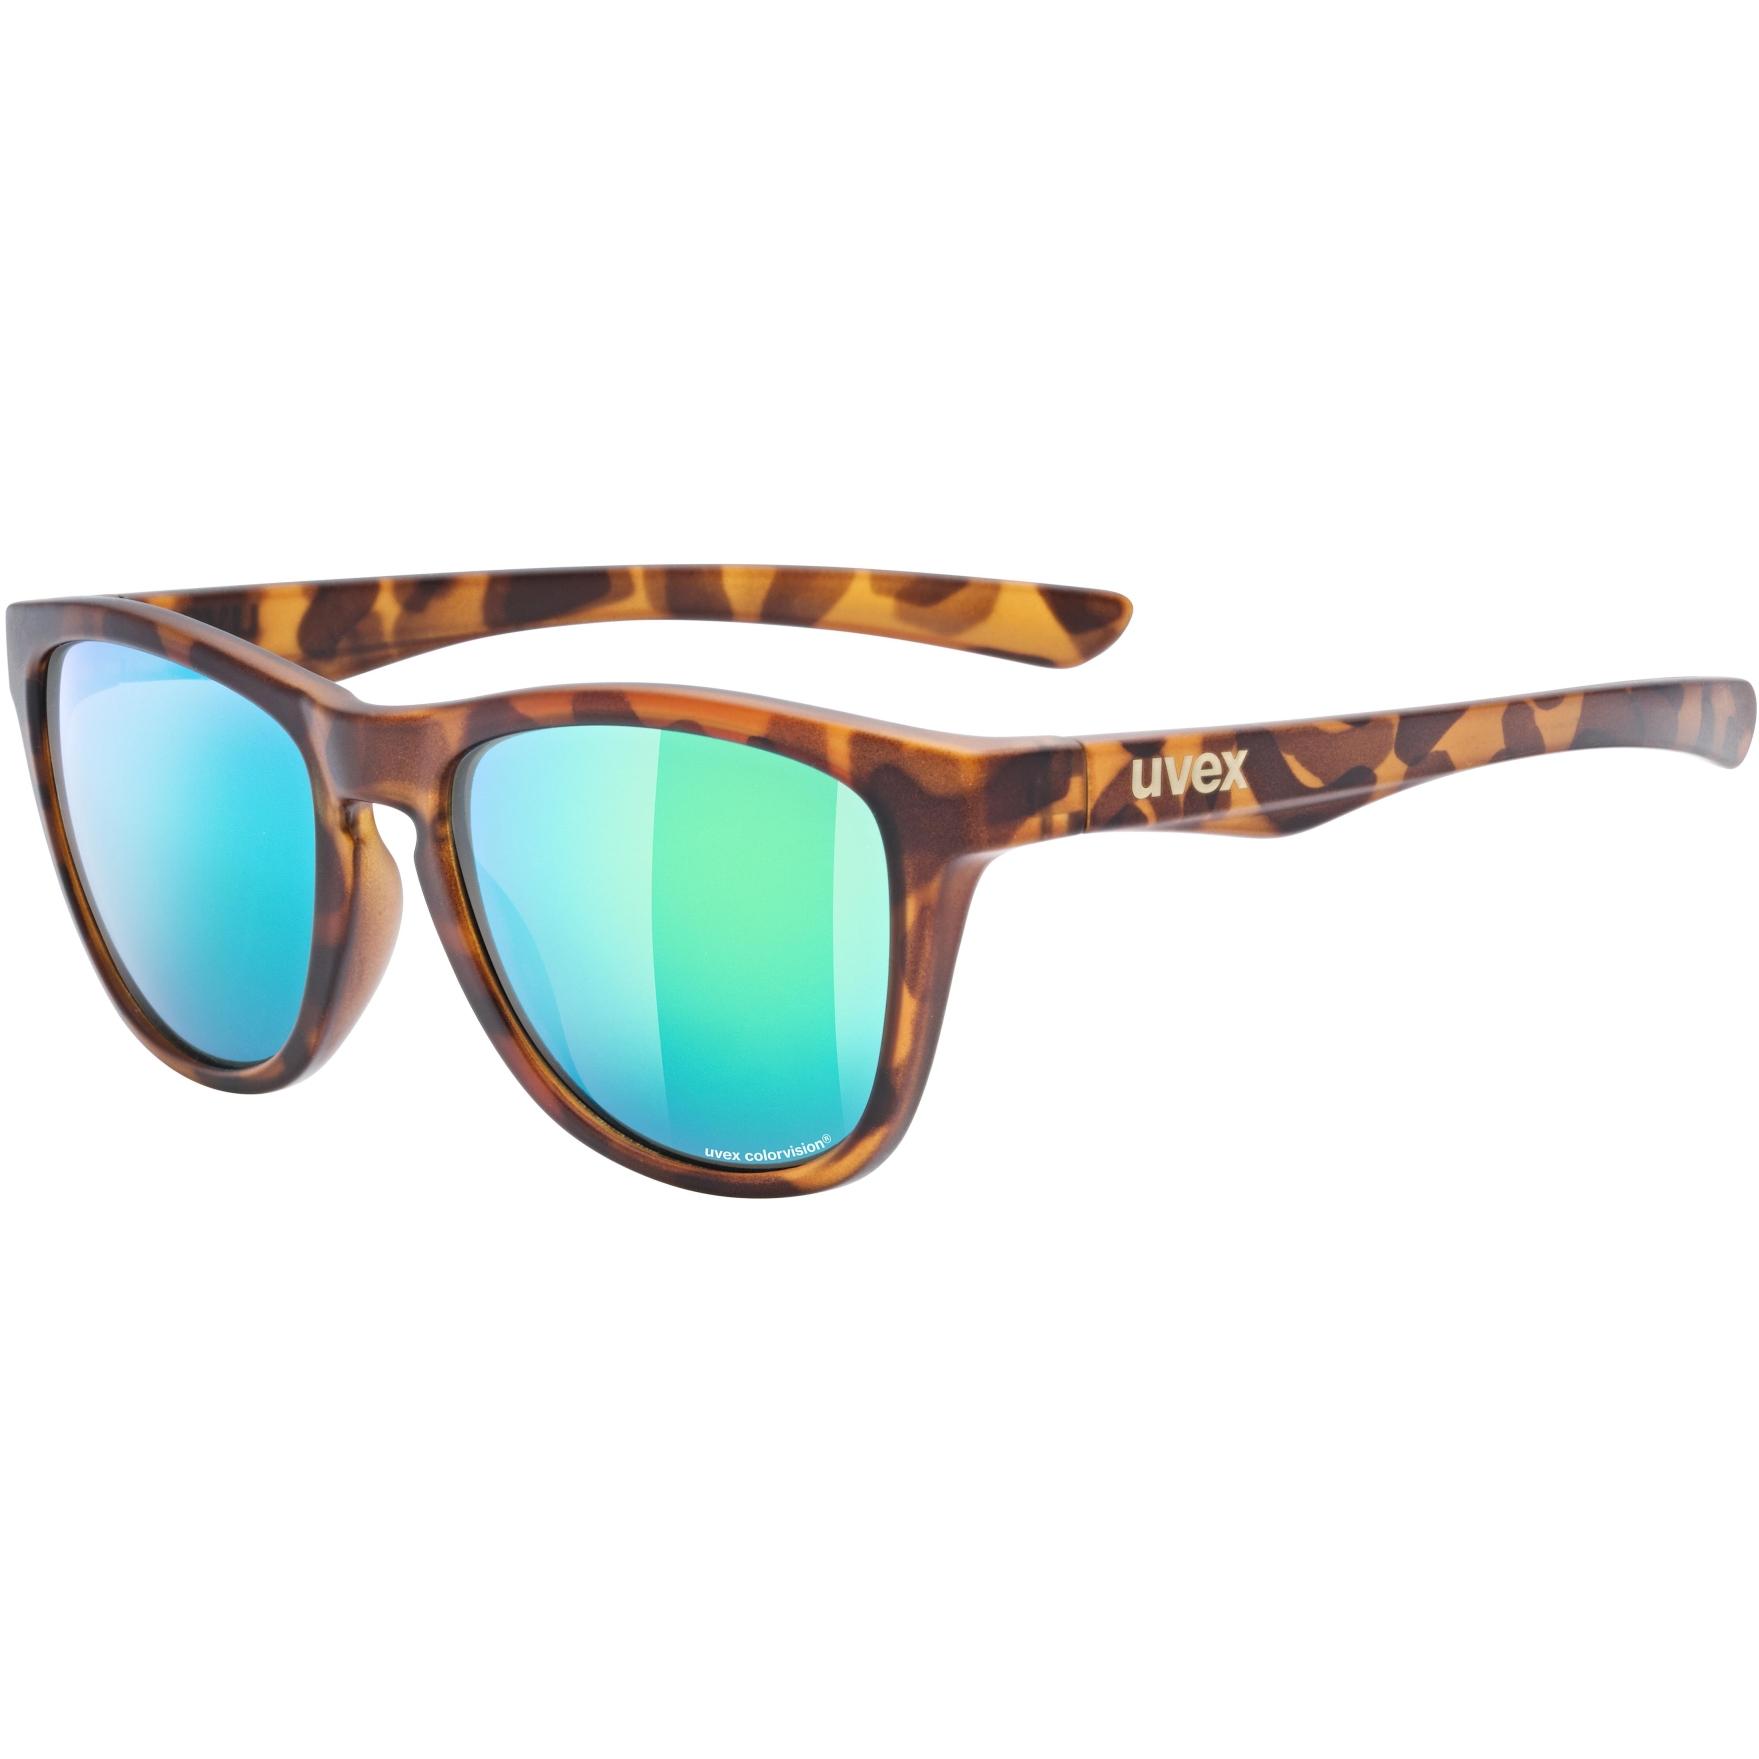 Uvex lgl 48 CV Glasses - havanna mat/colorvision mirror green